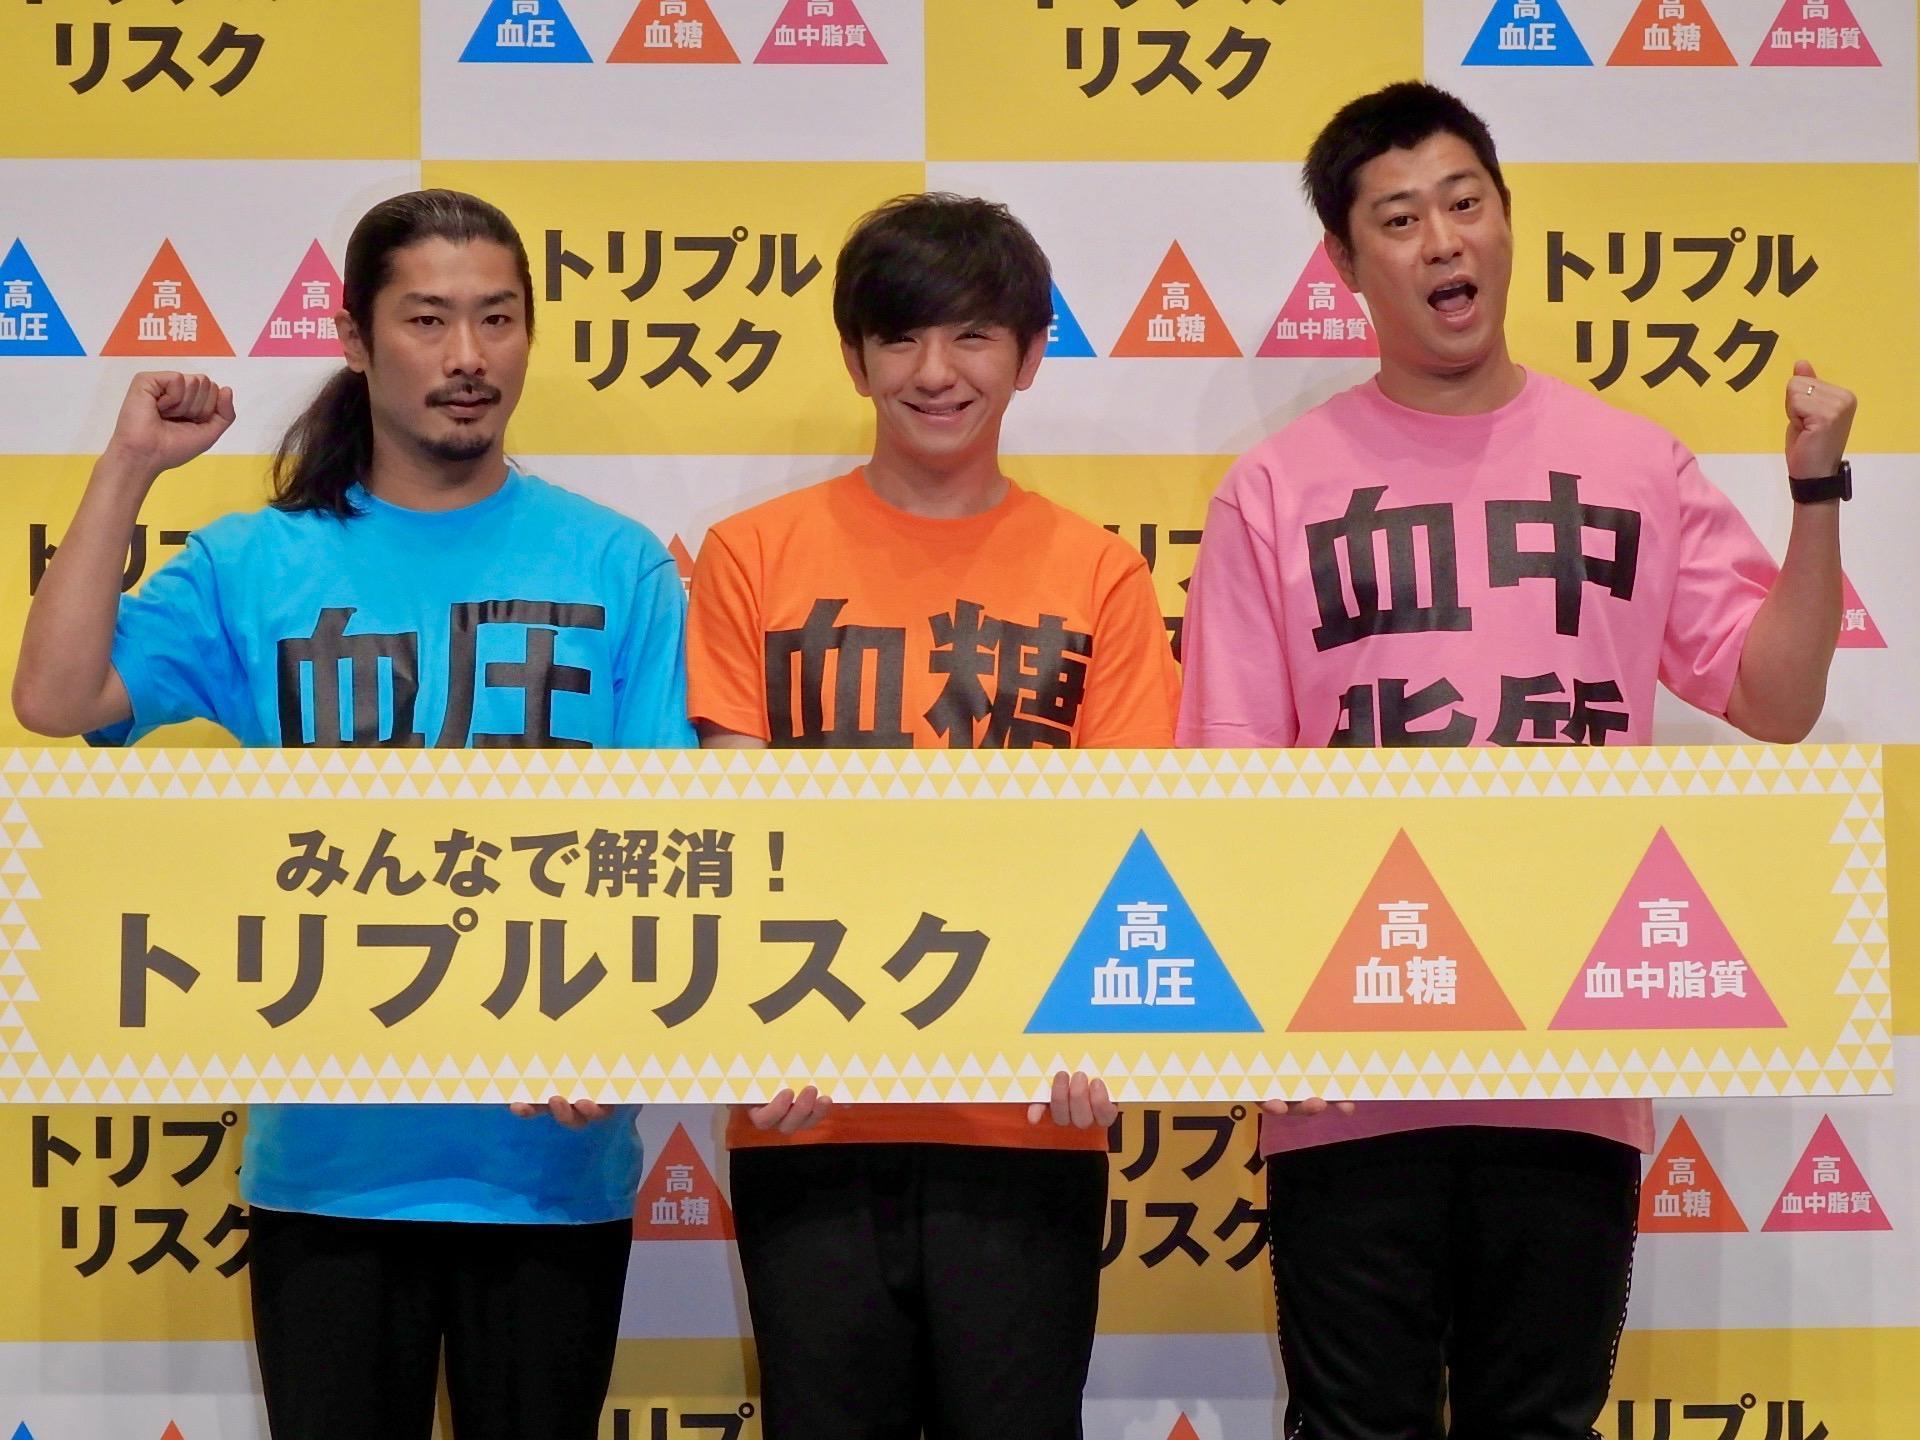 http://news.yoshimoto.co.jp/20180227230613-82b8d7a9e7b2793005375afc568874bdf192d268.jpg